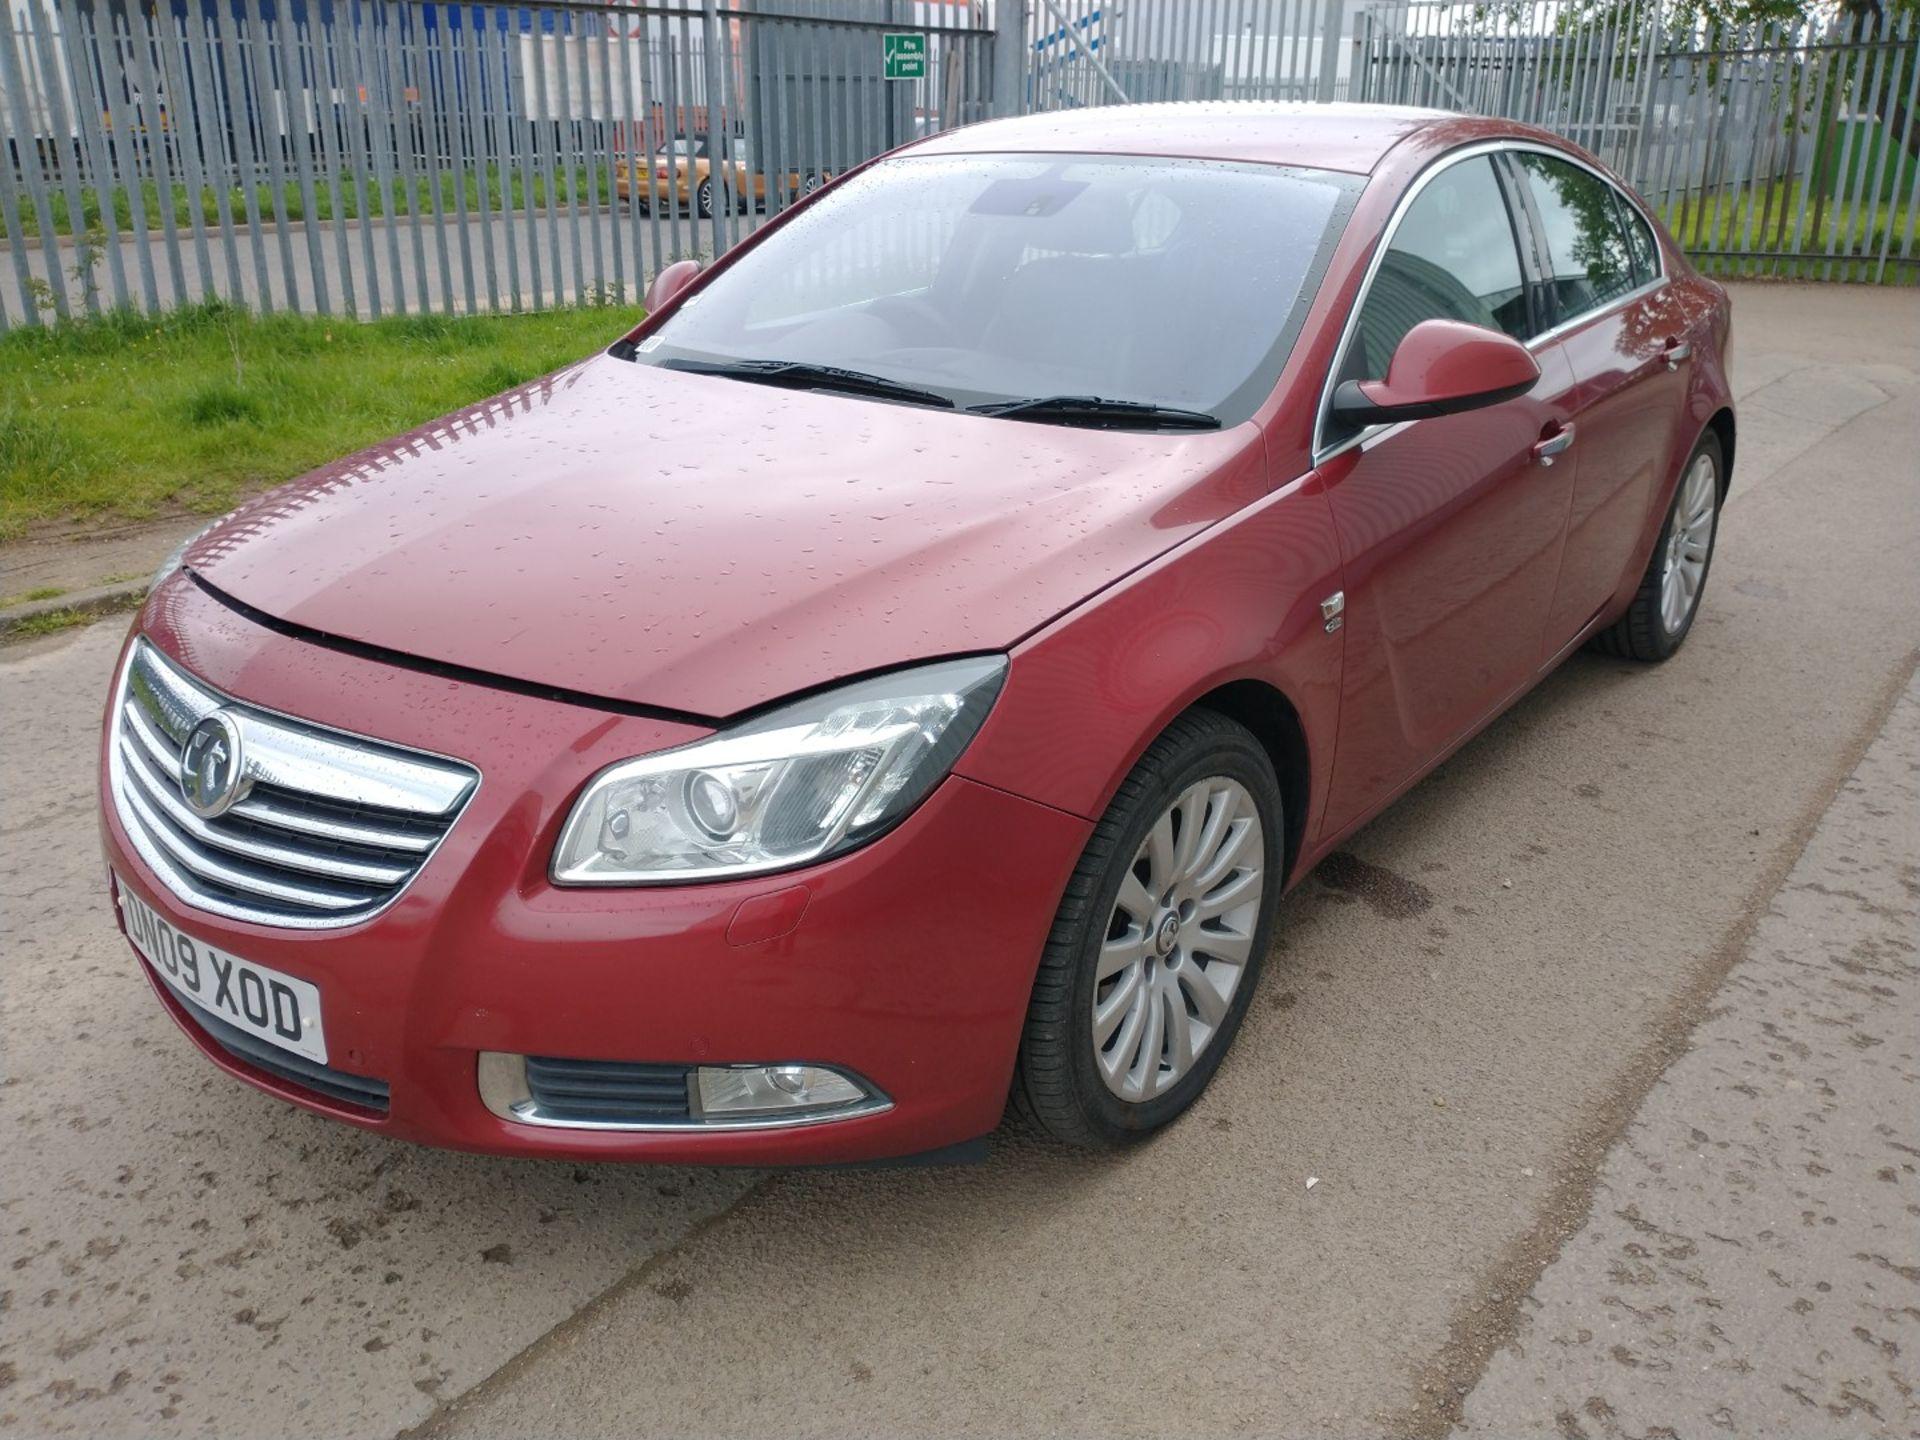 2009 Vauxhall Insignia Elite Nav CDTI 5dr 2.0 Diesel - CL505 - NO VAT ON THE HAMMER - Location: Corb